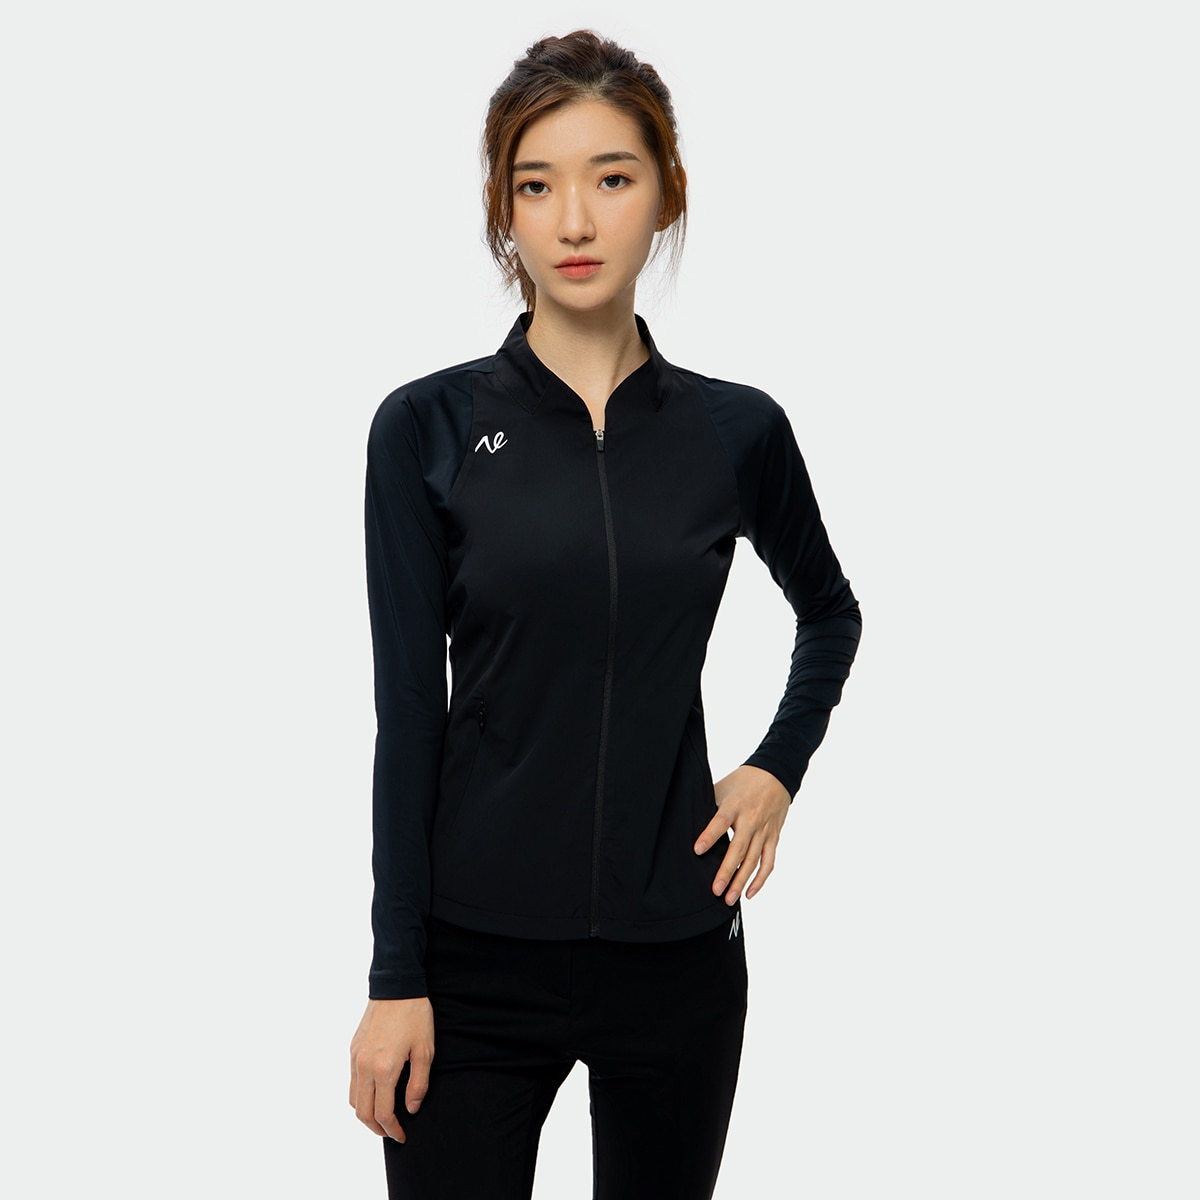 Autumn Golf Jacket Ladies, Windproof Jacket Women's Golf Wear Outdoor Sports Running Clothes